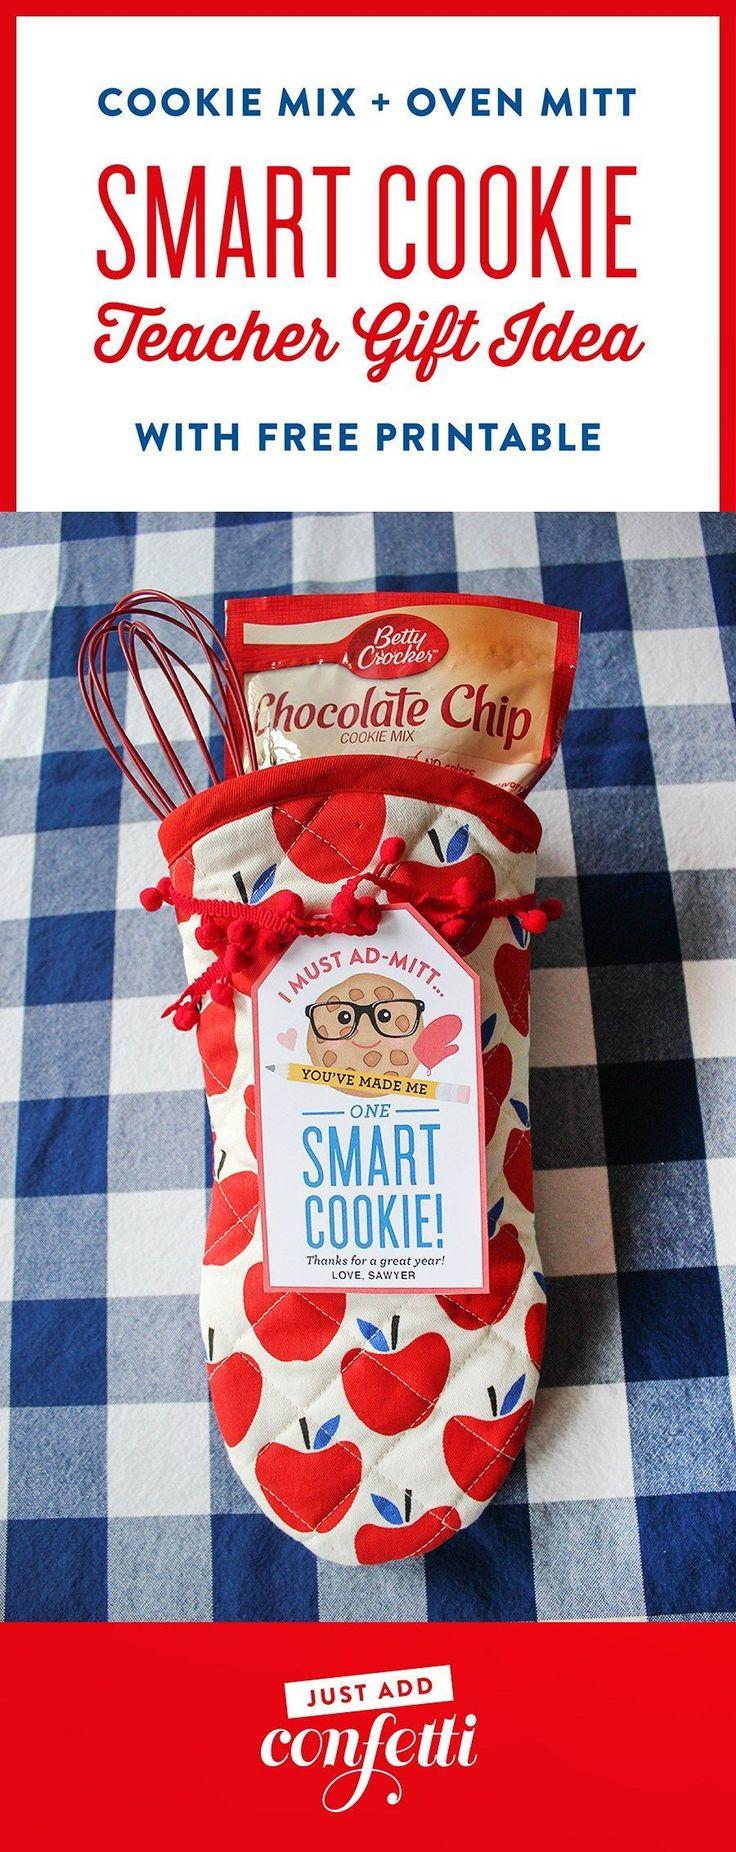 "Oven Mitt ""Smart Cookie"" Teacher Gift Idea"